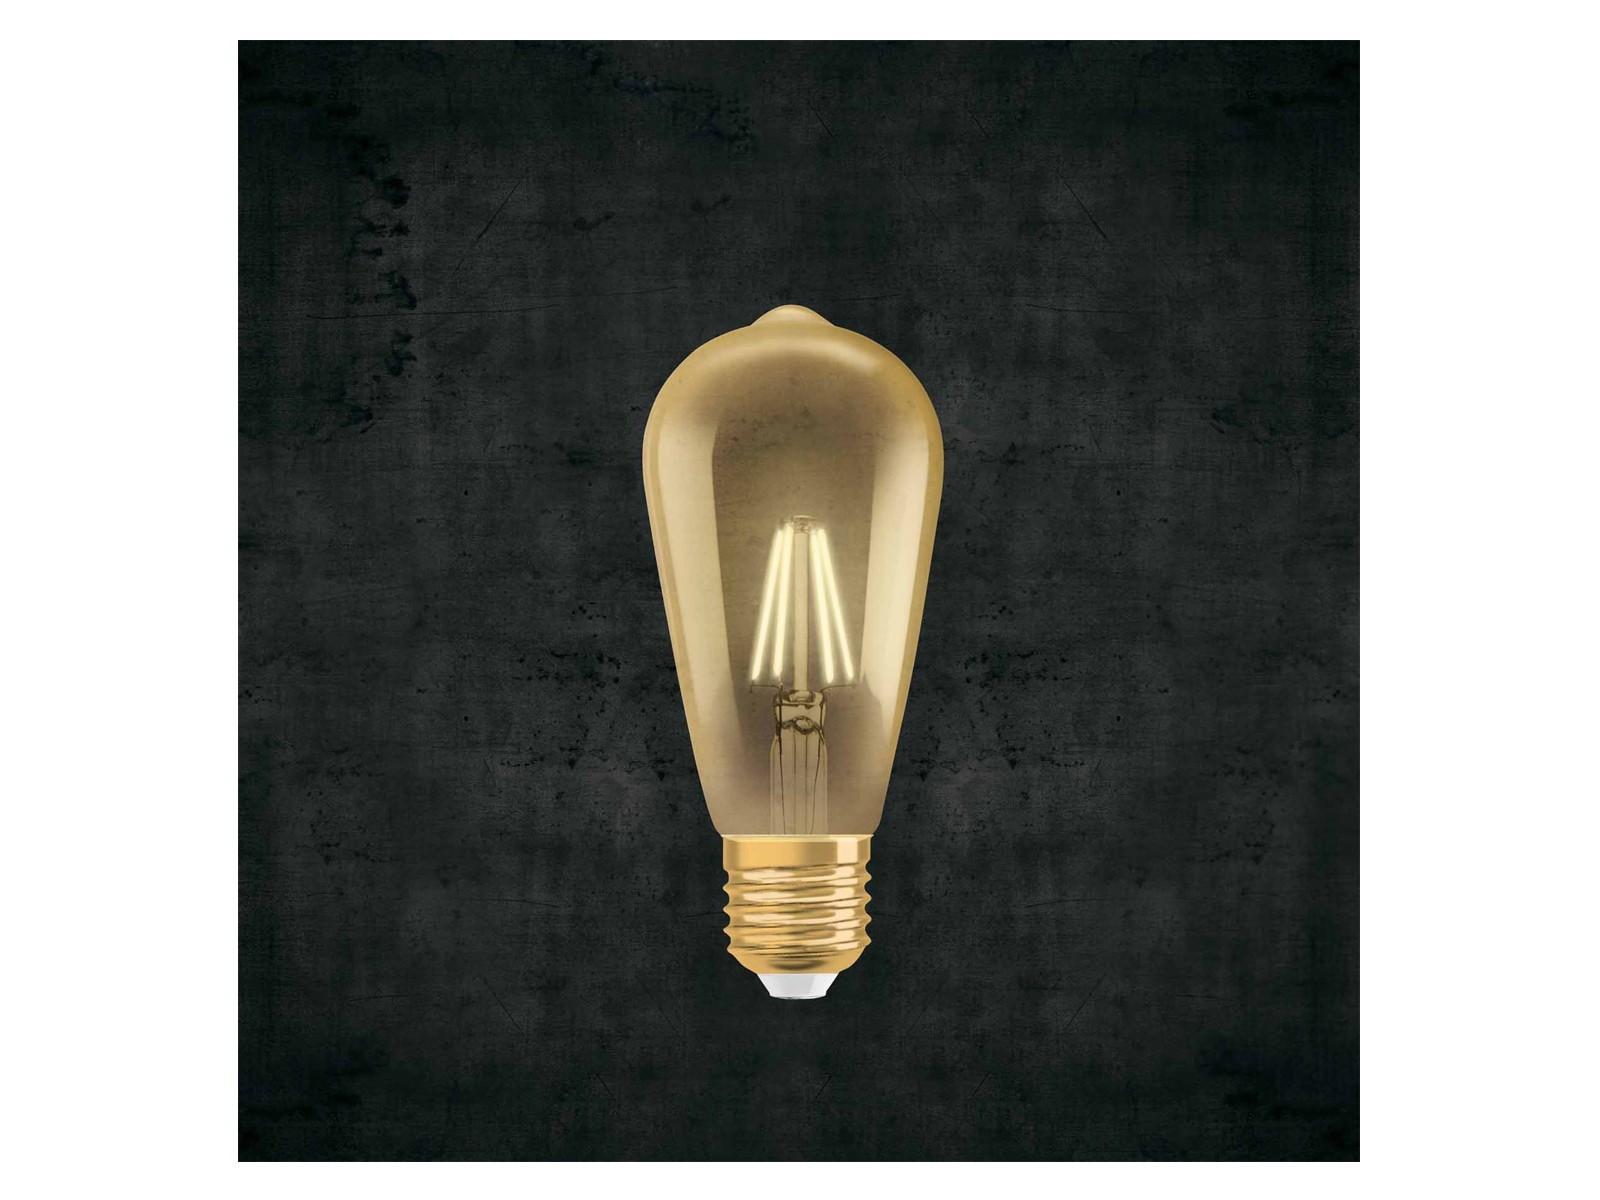 dimmbare osram led vintage 1906 7w st64 e27 710 lumen warm. Black Bedroom Furniture Sets. Home Design Ideas